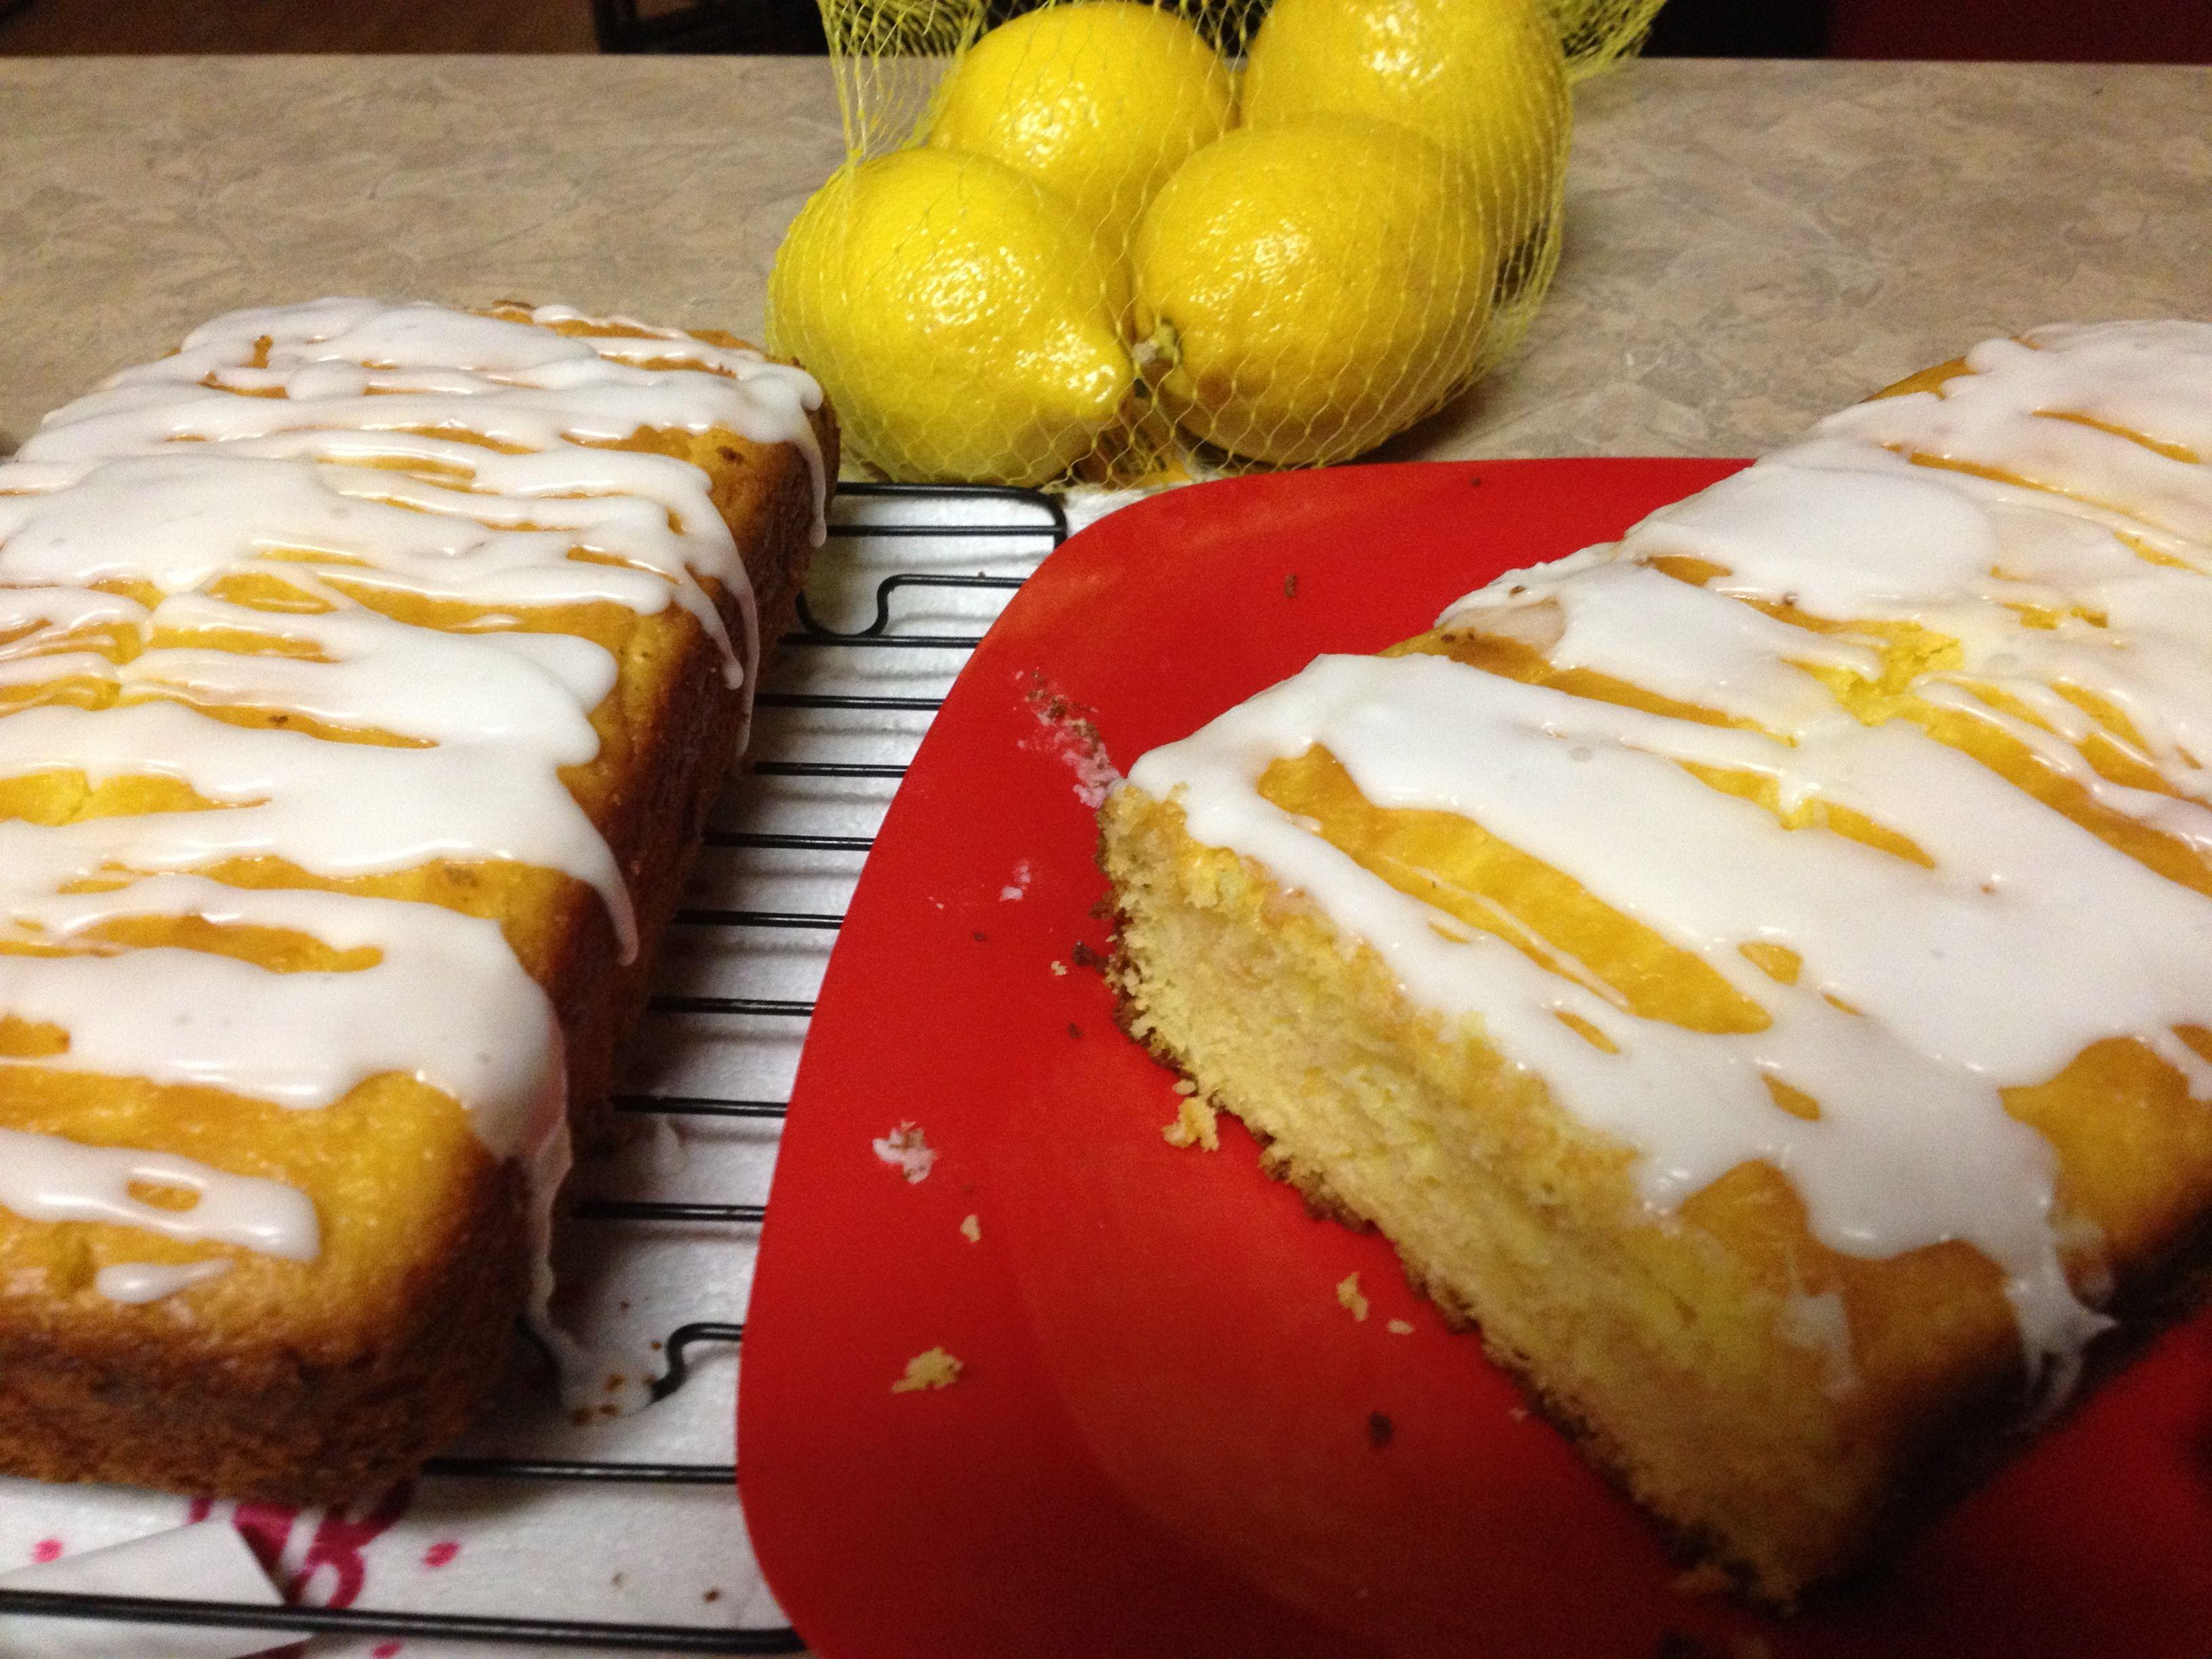 Easy lemon pound cake 1 box yellow cake mix 1 box instant